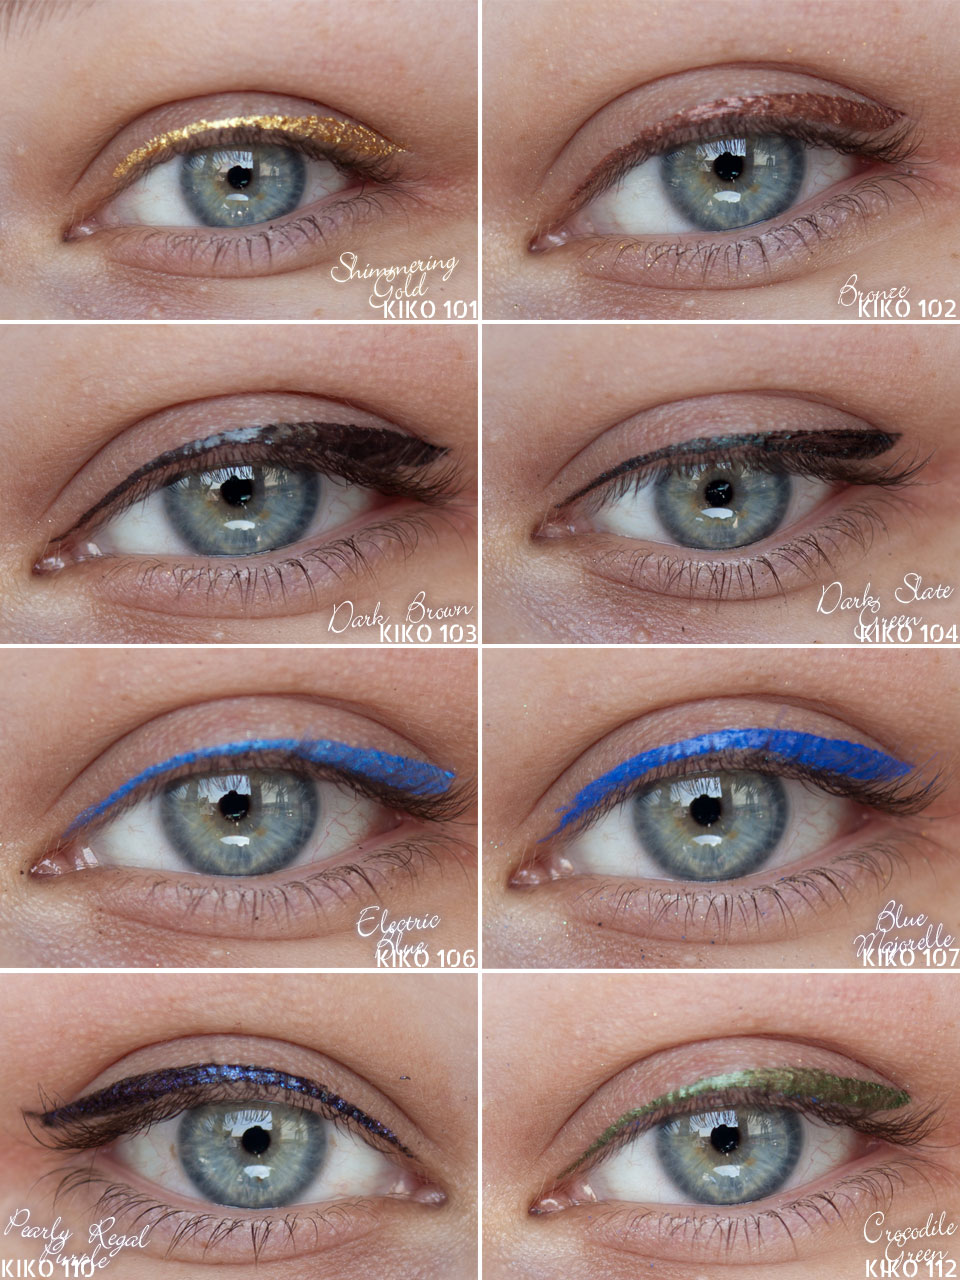 KIKO Super Colour Eyeliner Swatch Lid